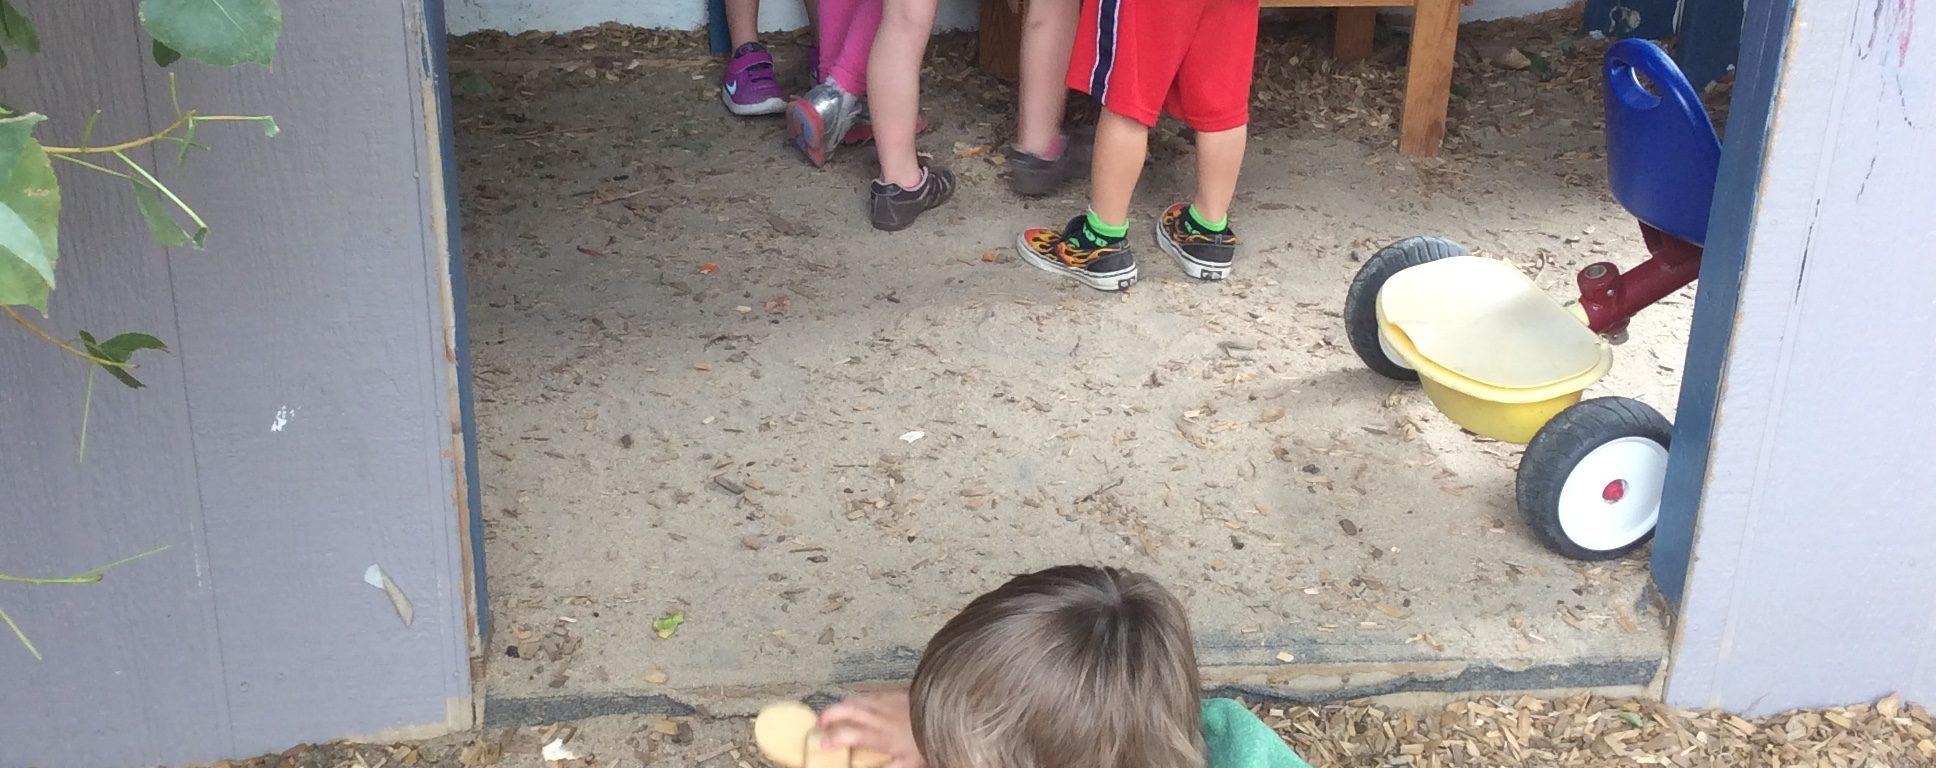 Plane Imaginitive Play Patchwork Preschool